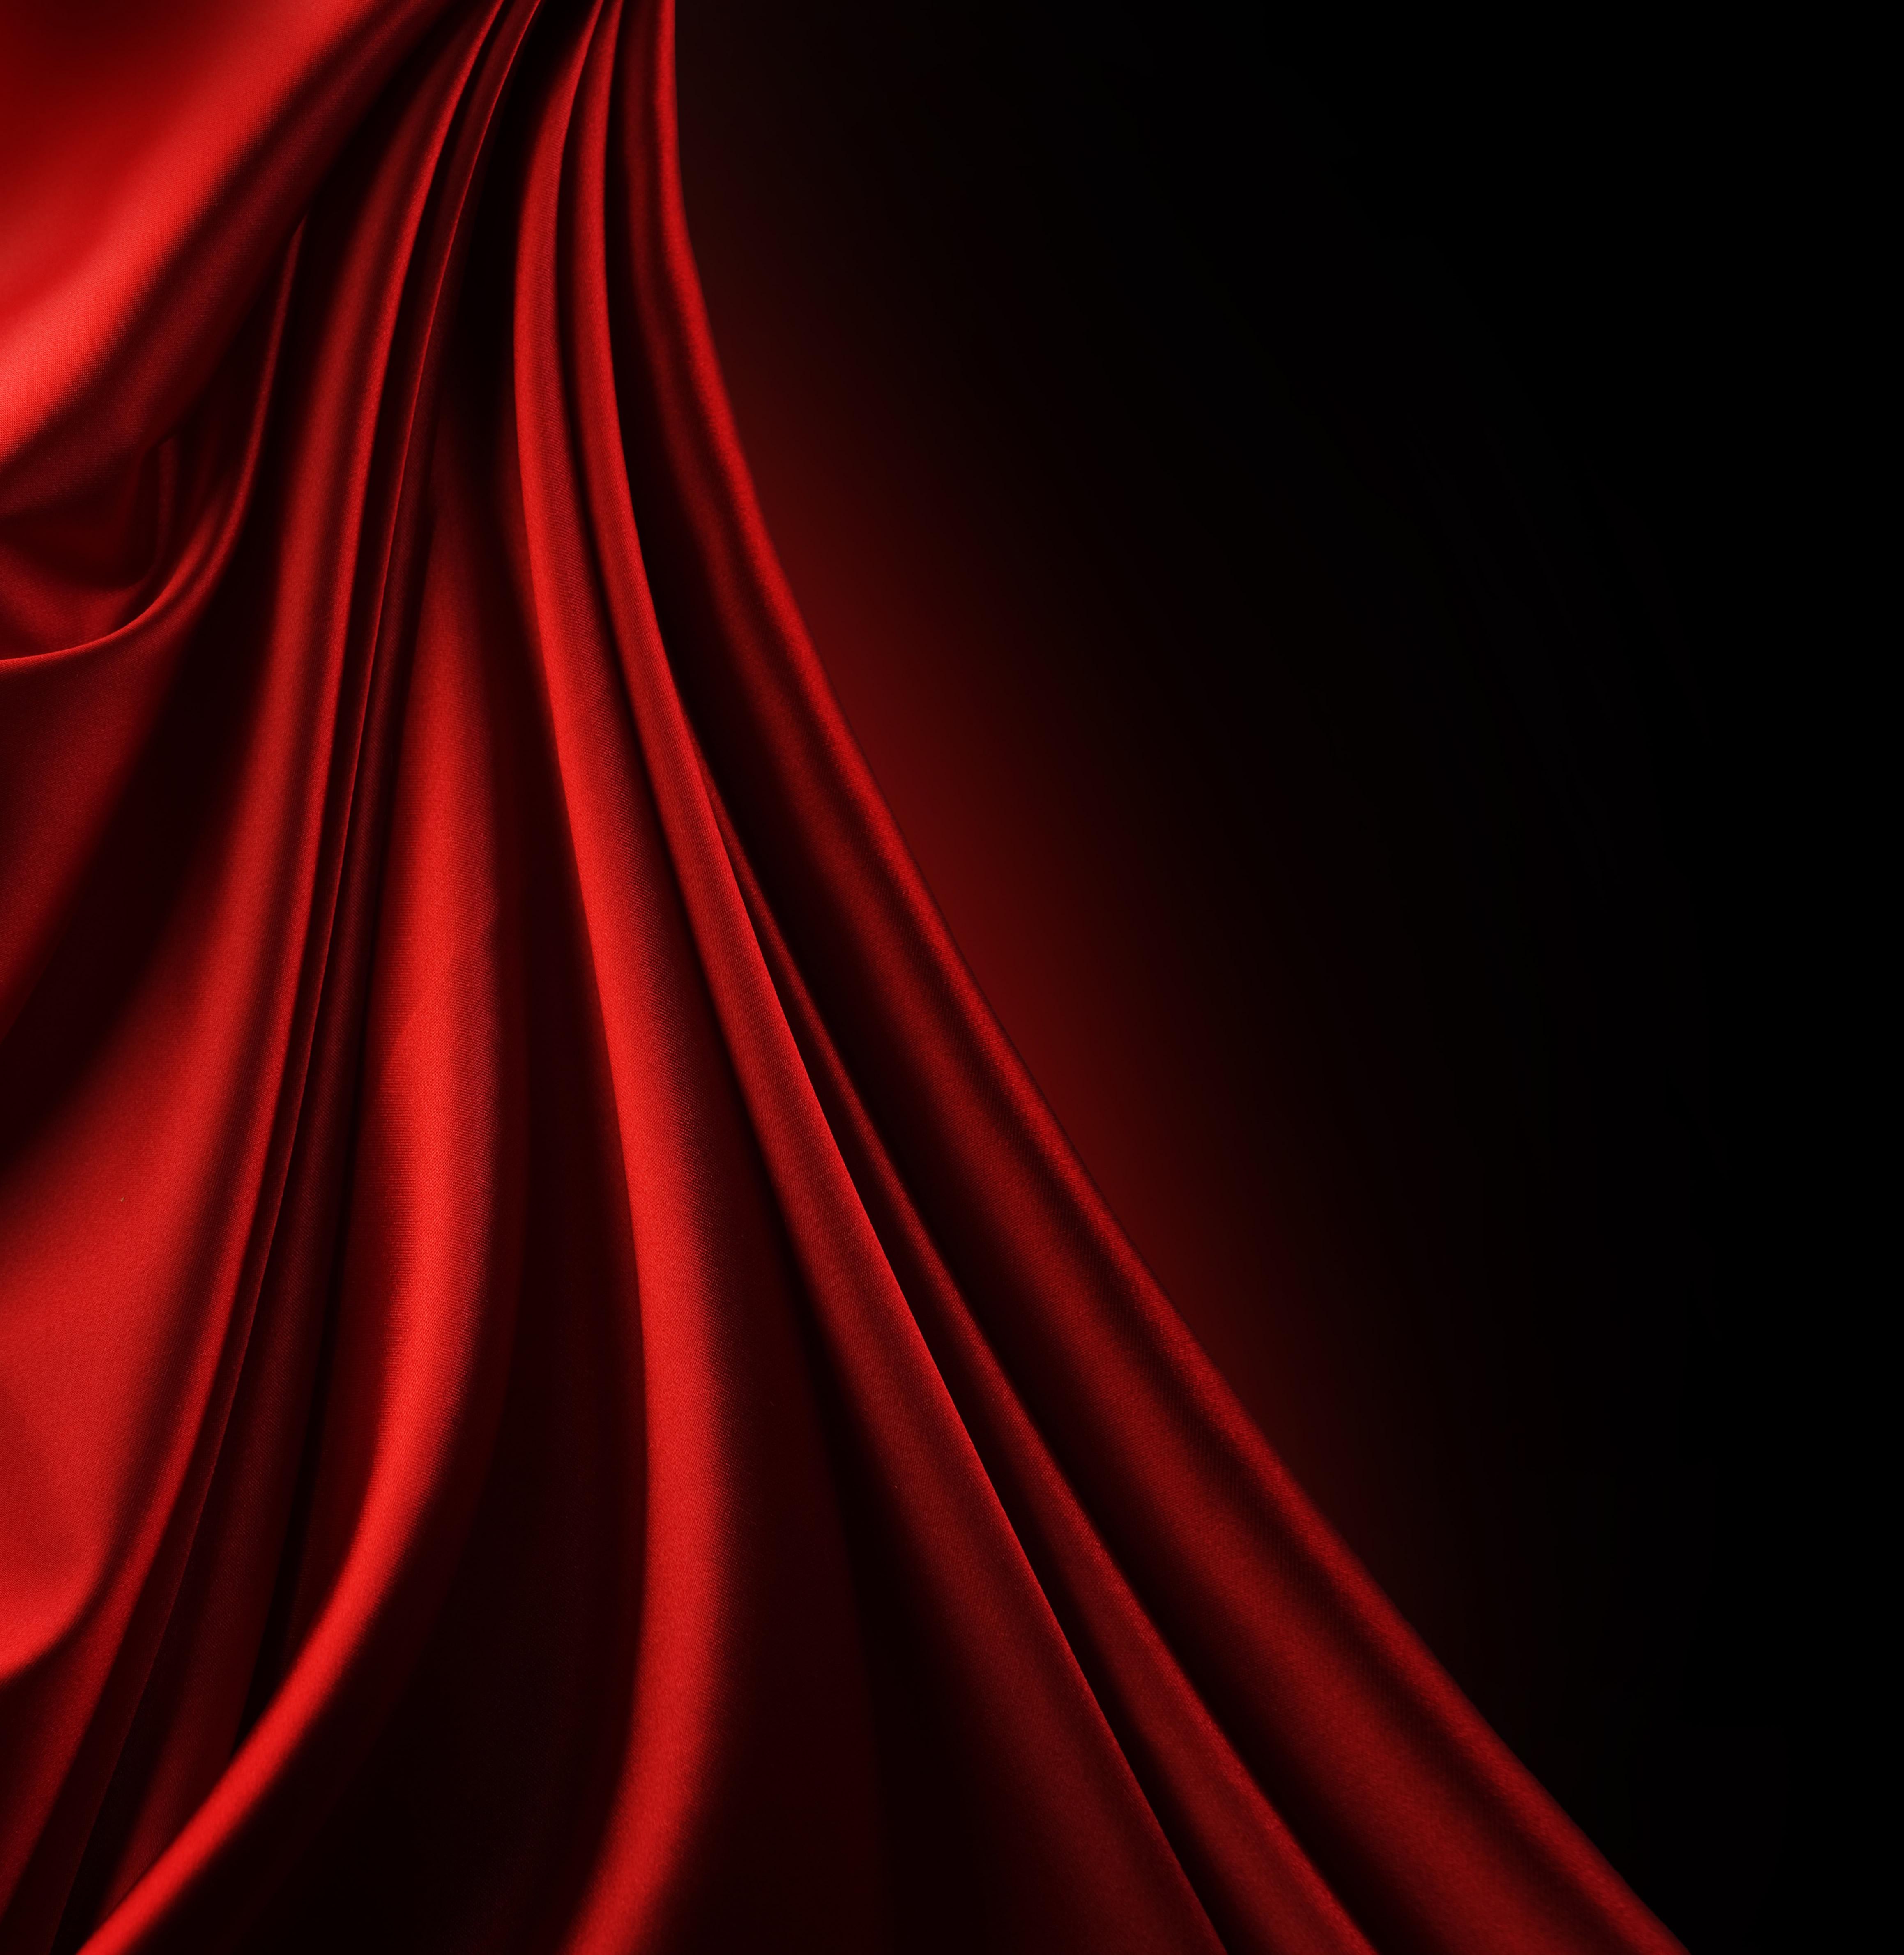 Red Satin Wallpaper 4635x4760